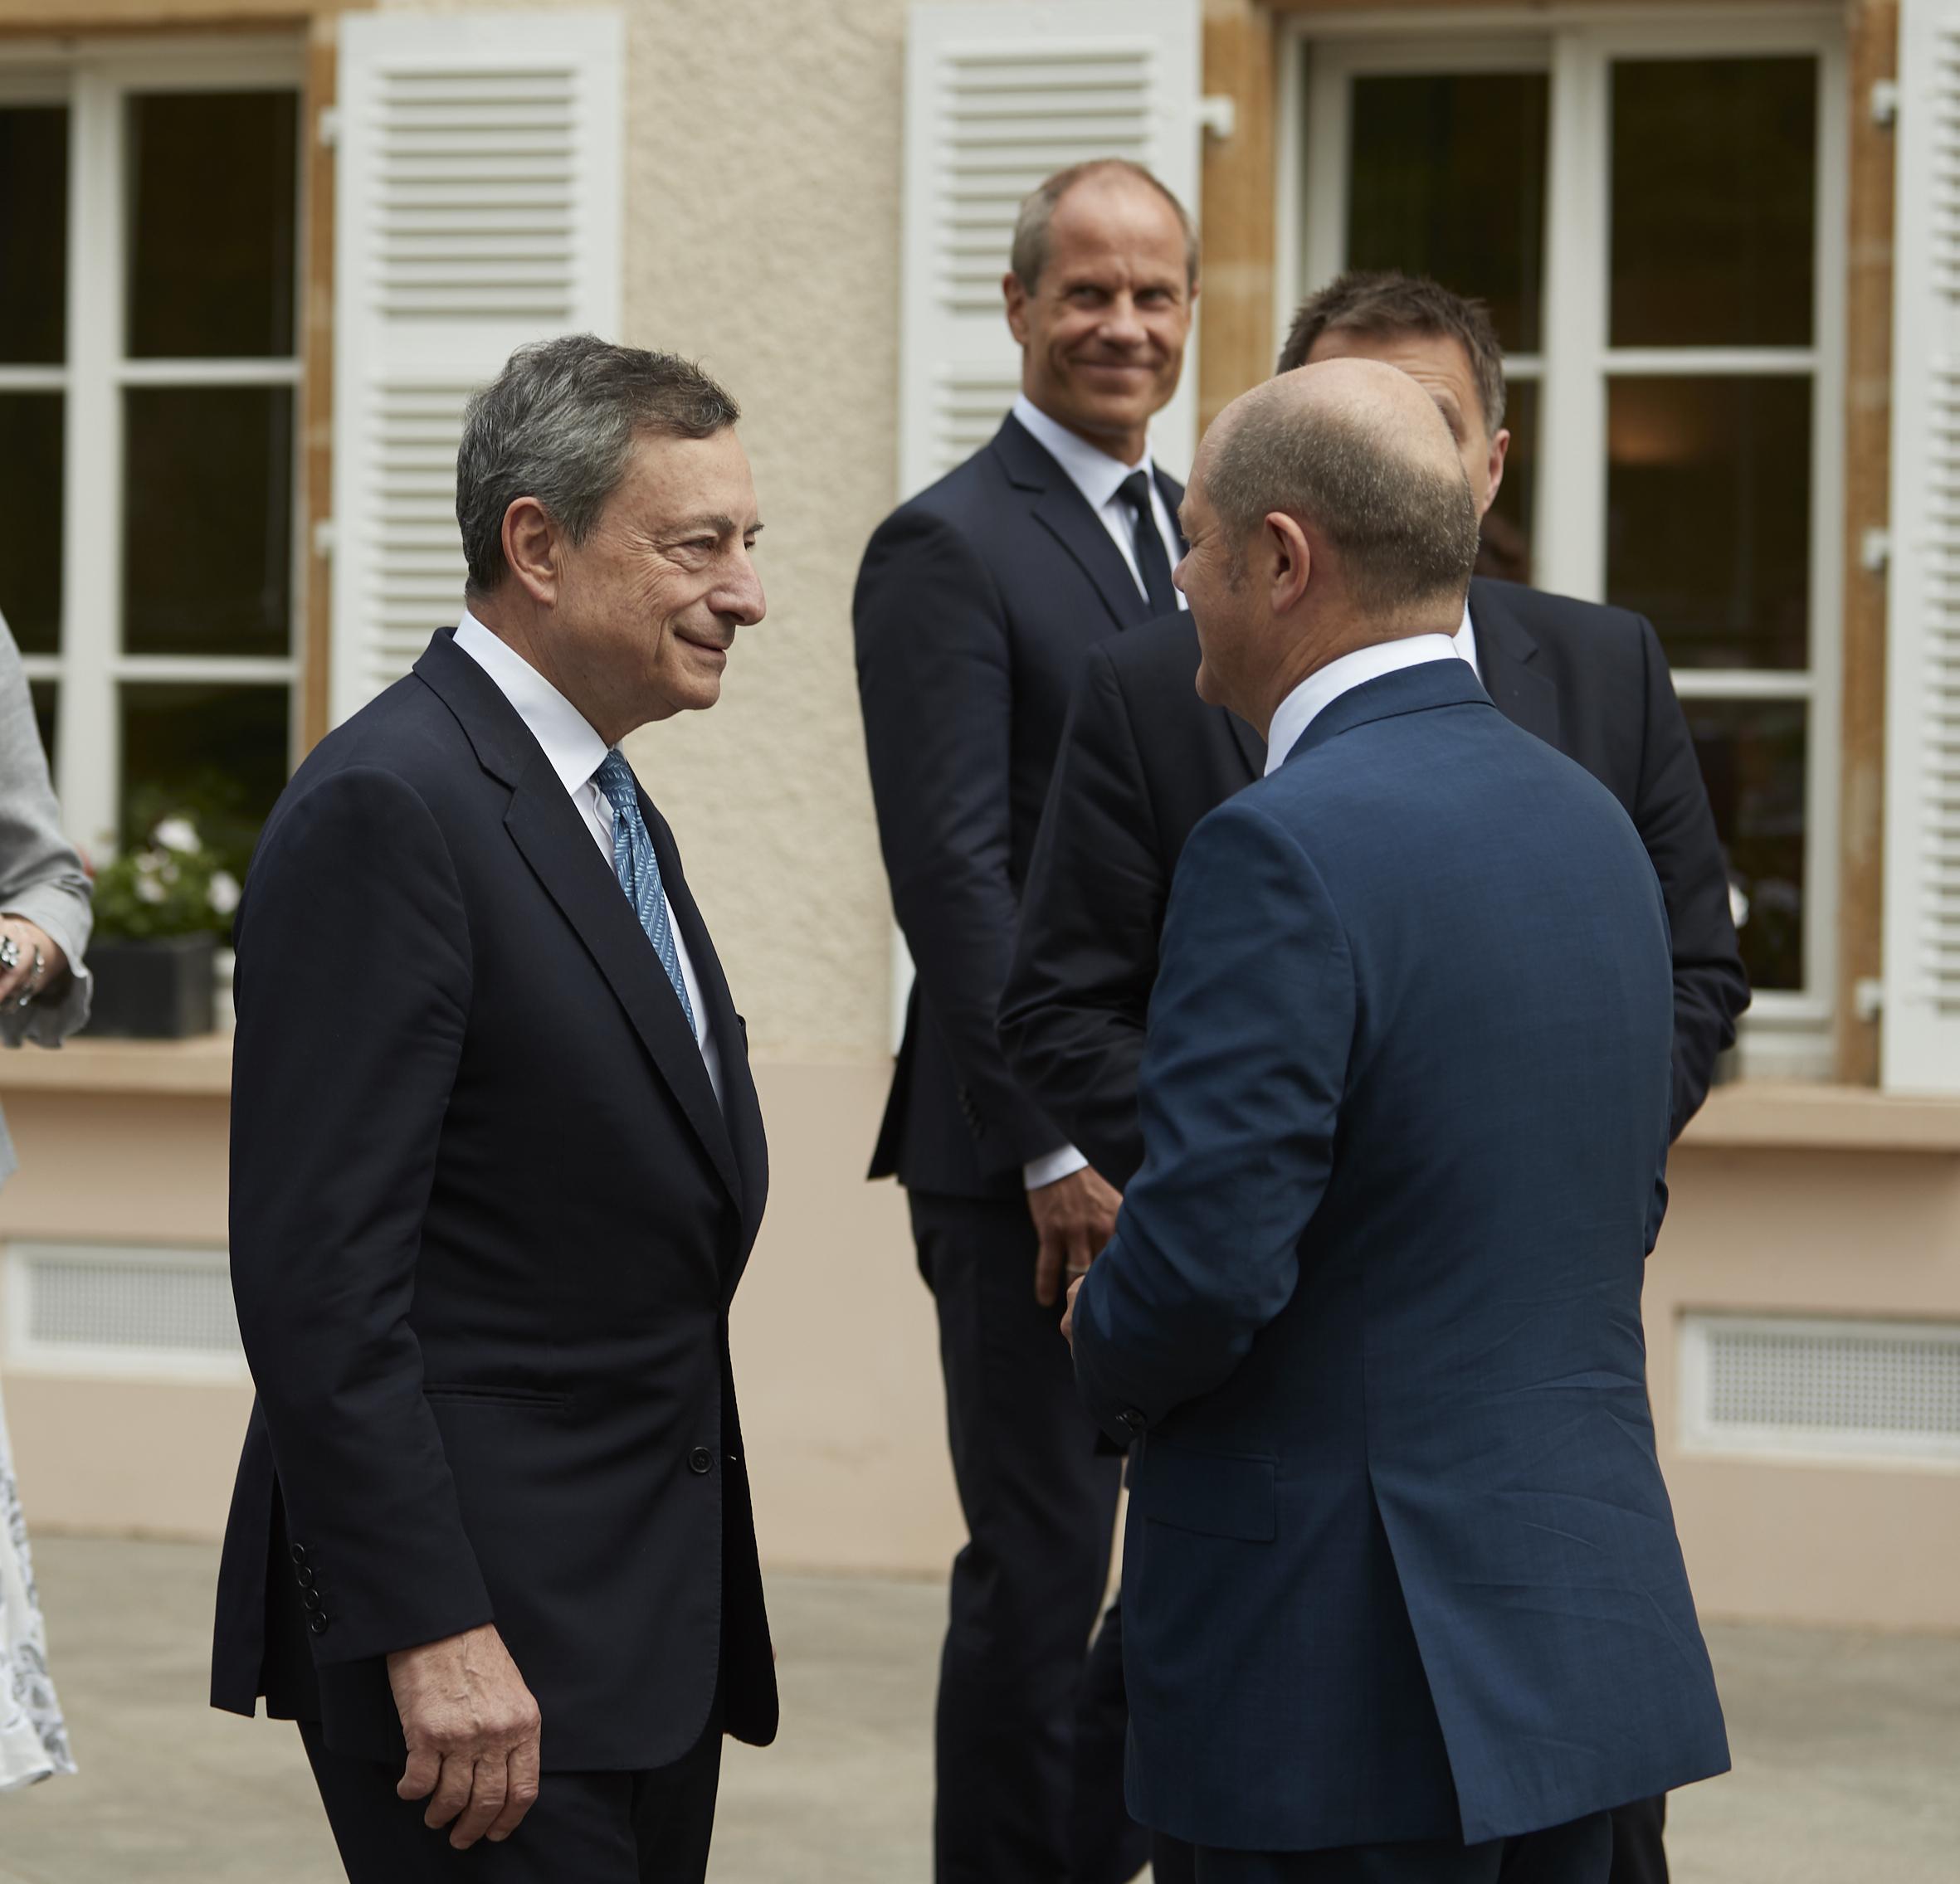 kare-kare-to-krisimo-eurogroup-fotografies13